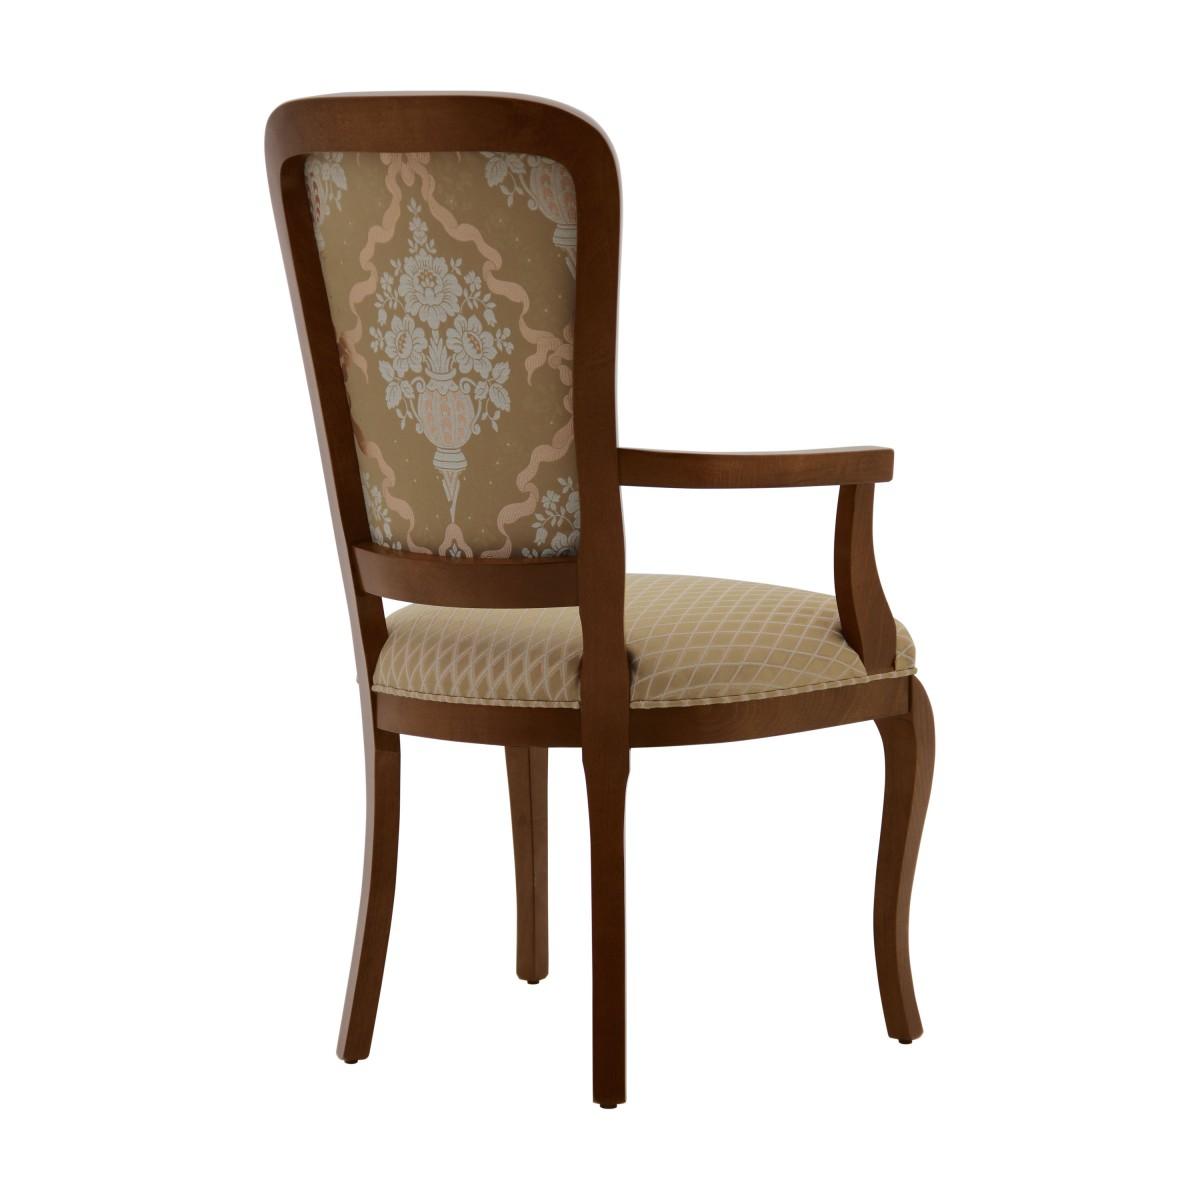 Small armchair Cavour - Sevensedie